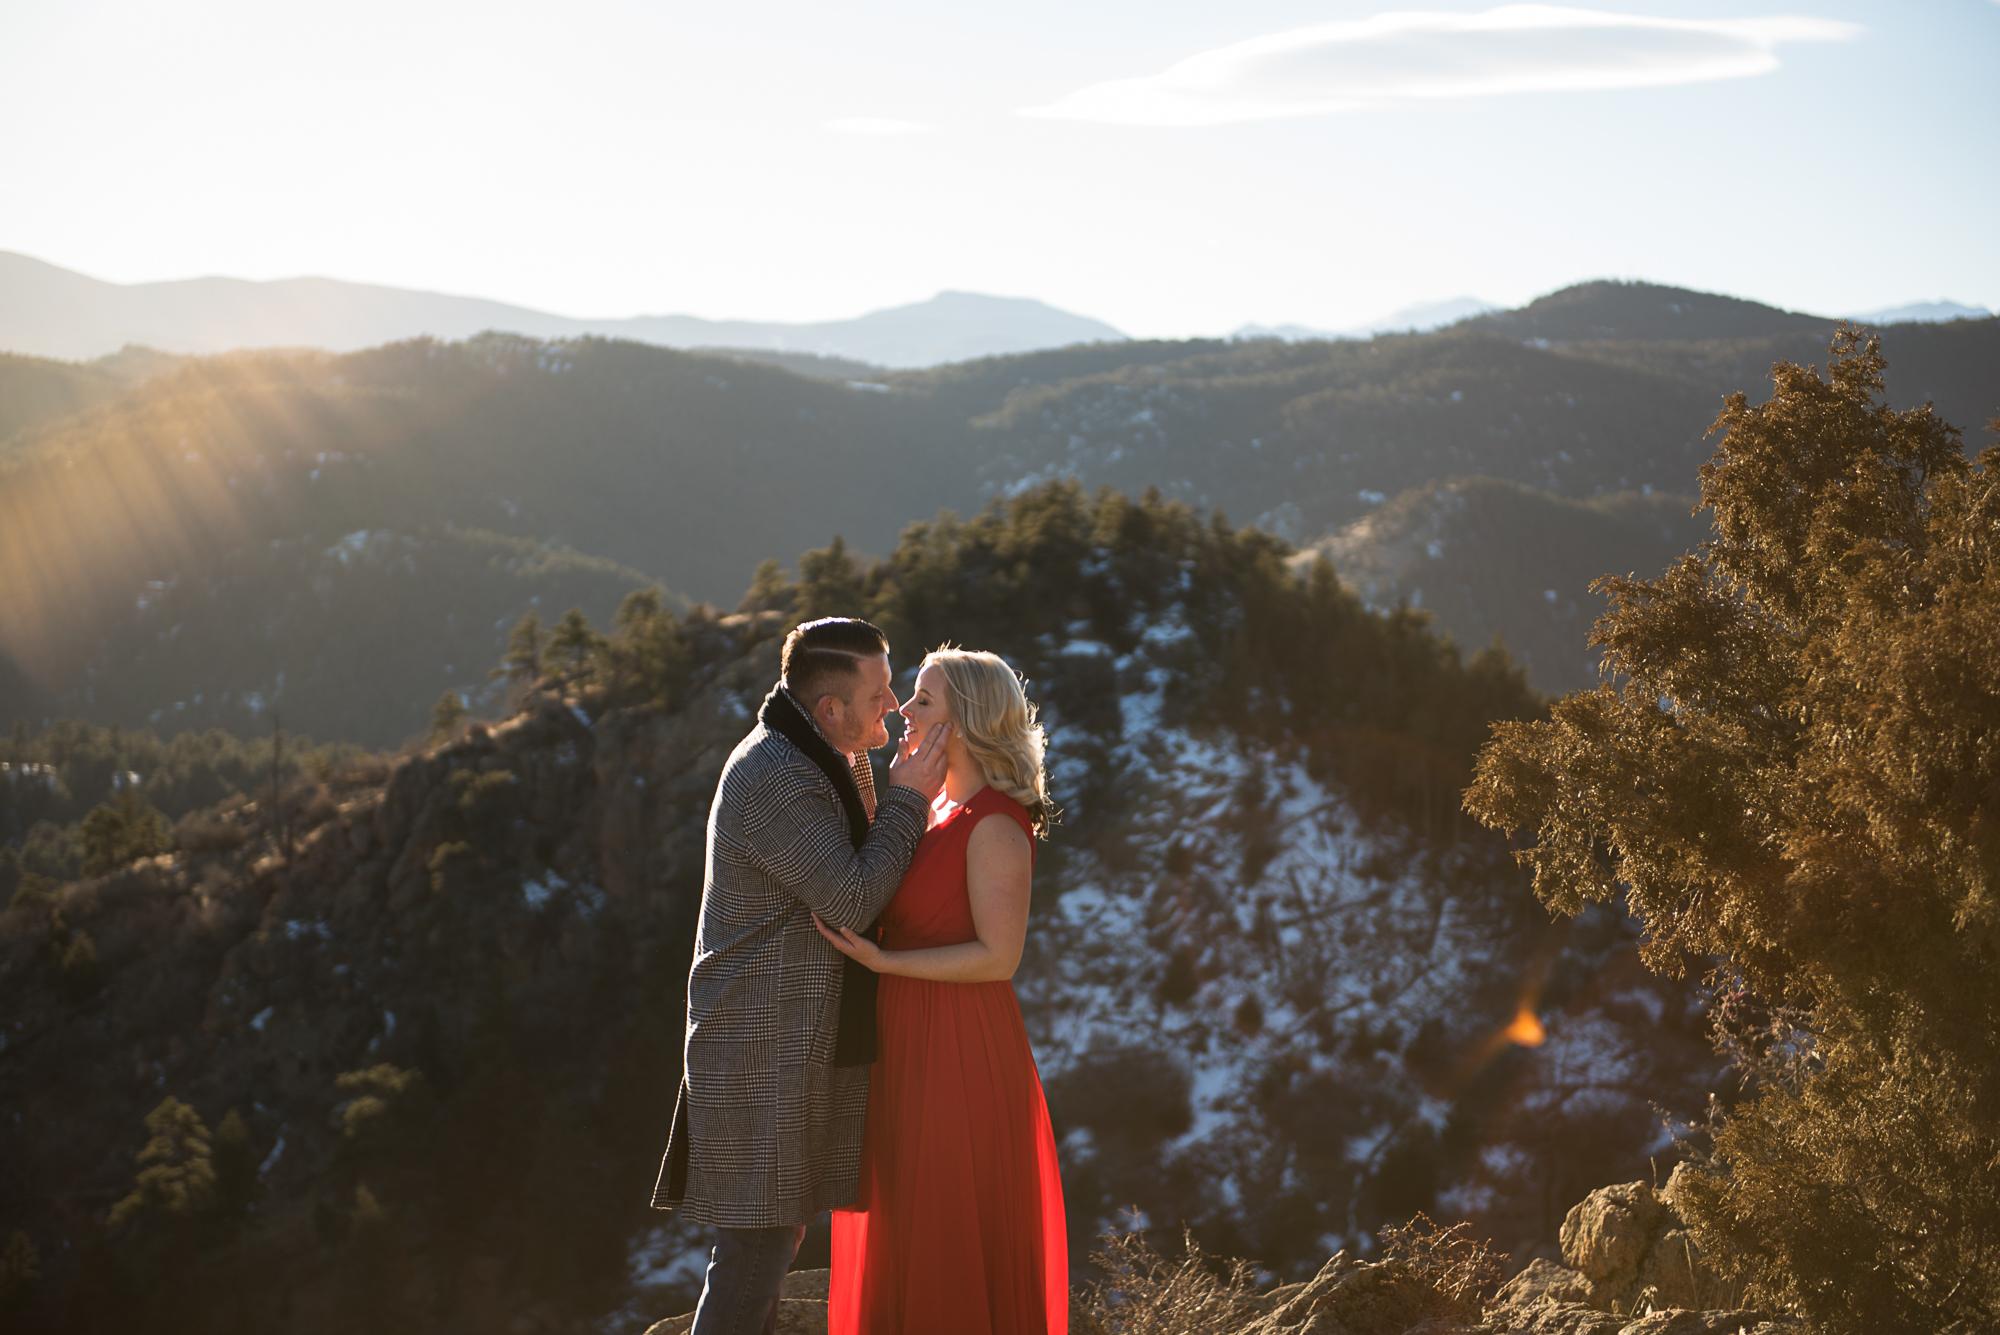 Colorado Wedding Photographer 10 (1 of 1).jpg